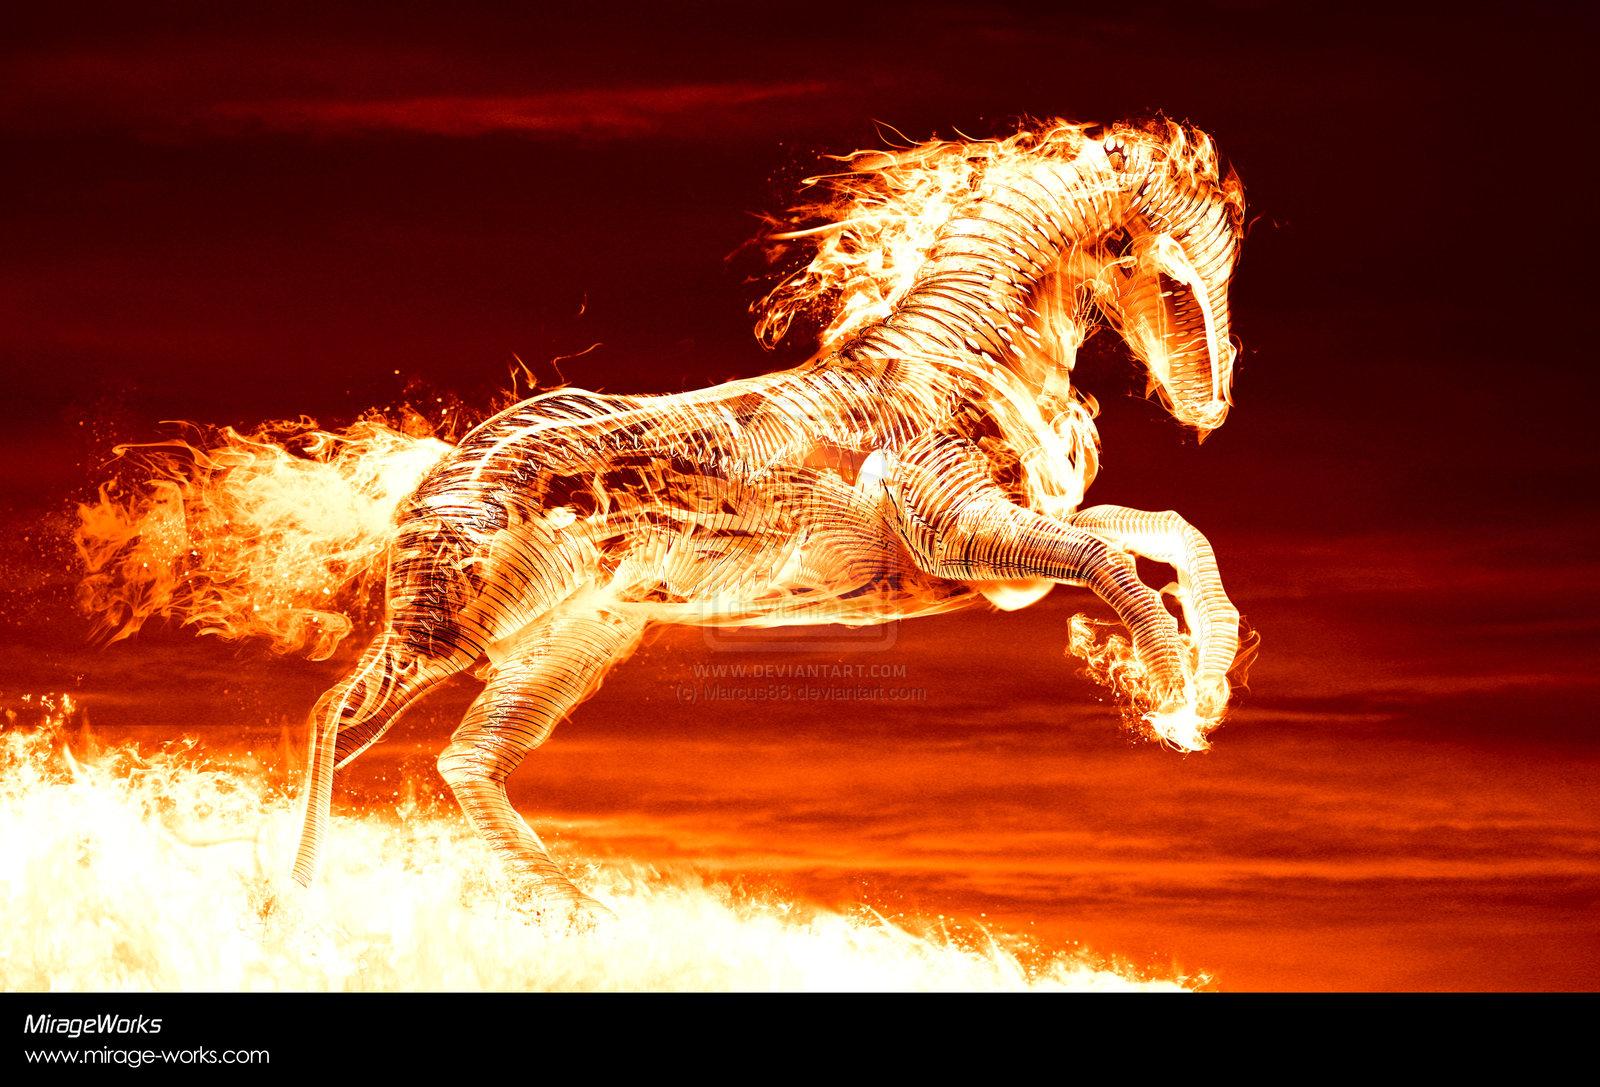 Animated Winter Wallpaper Free Desktop Fire Horse Eddition Hd Fire Horse All